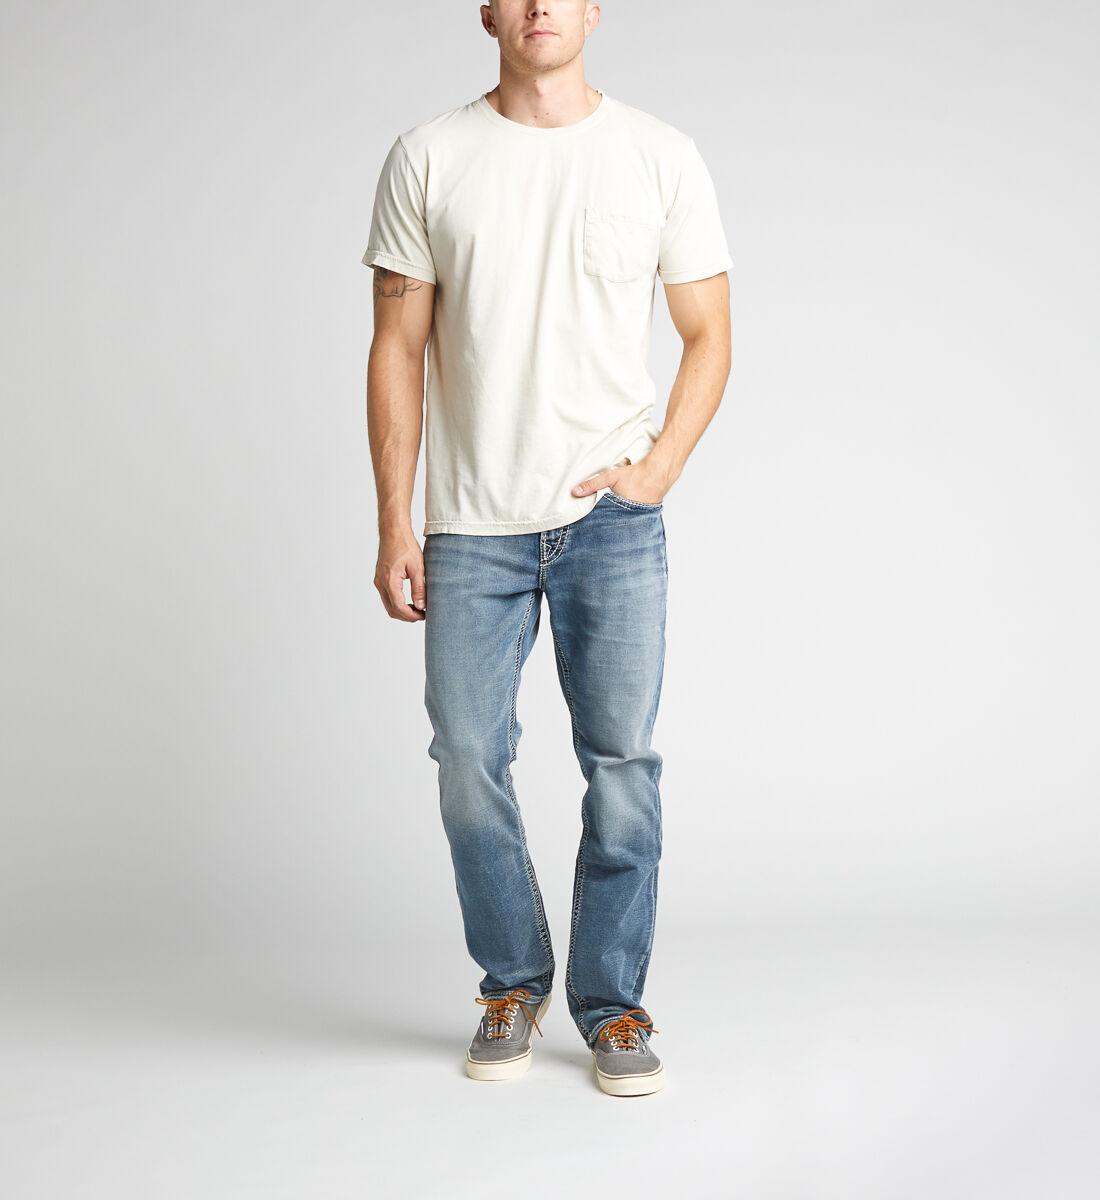 Grayson Easy Fit Straight Leg Jeans Alt Image 1